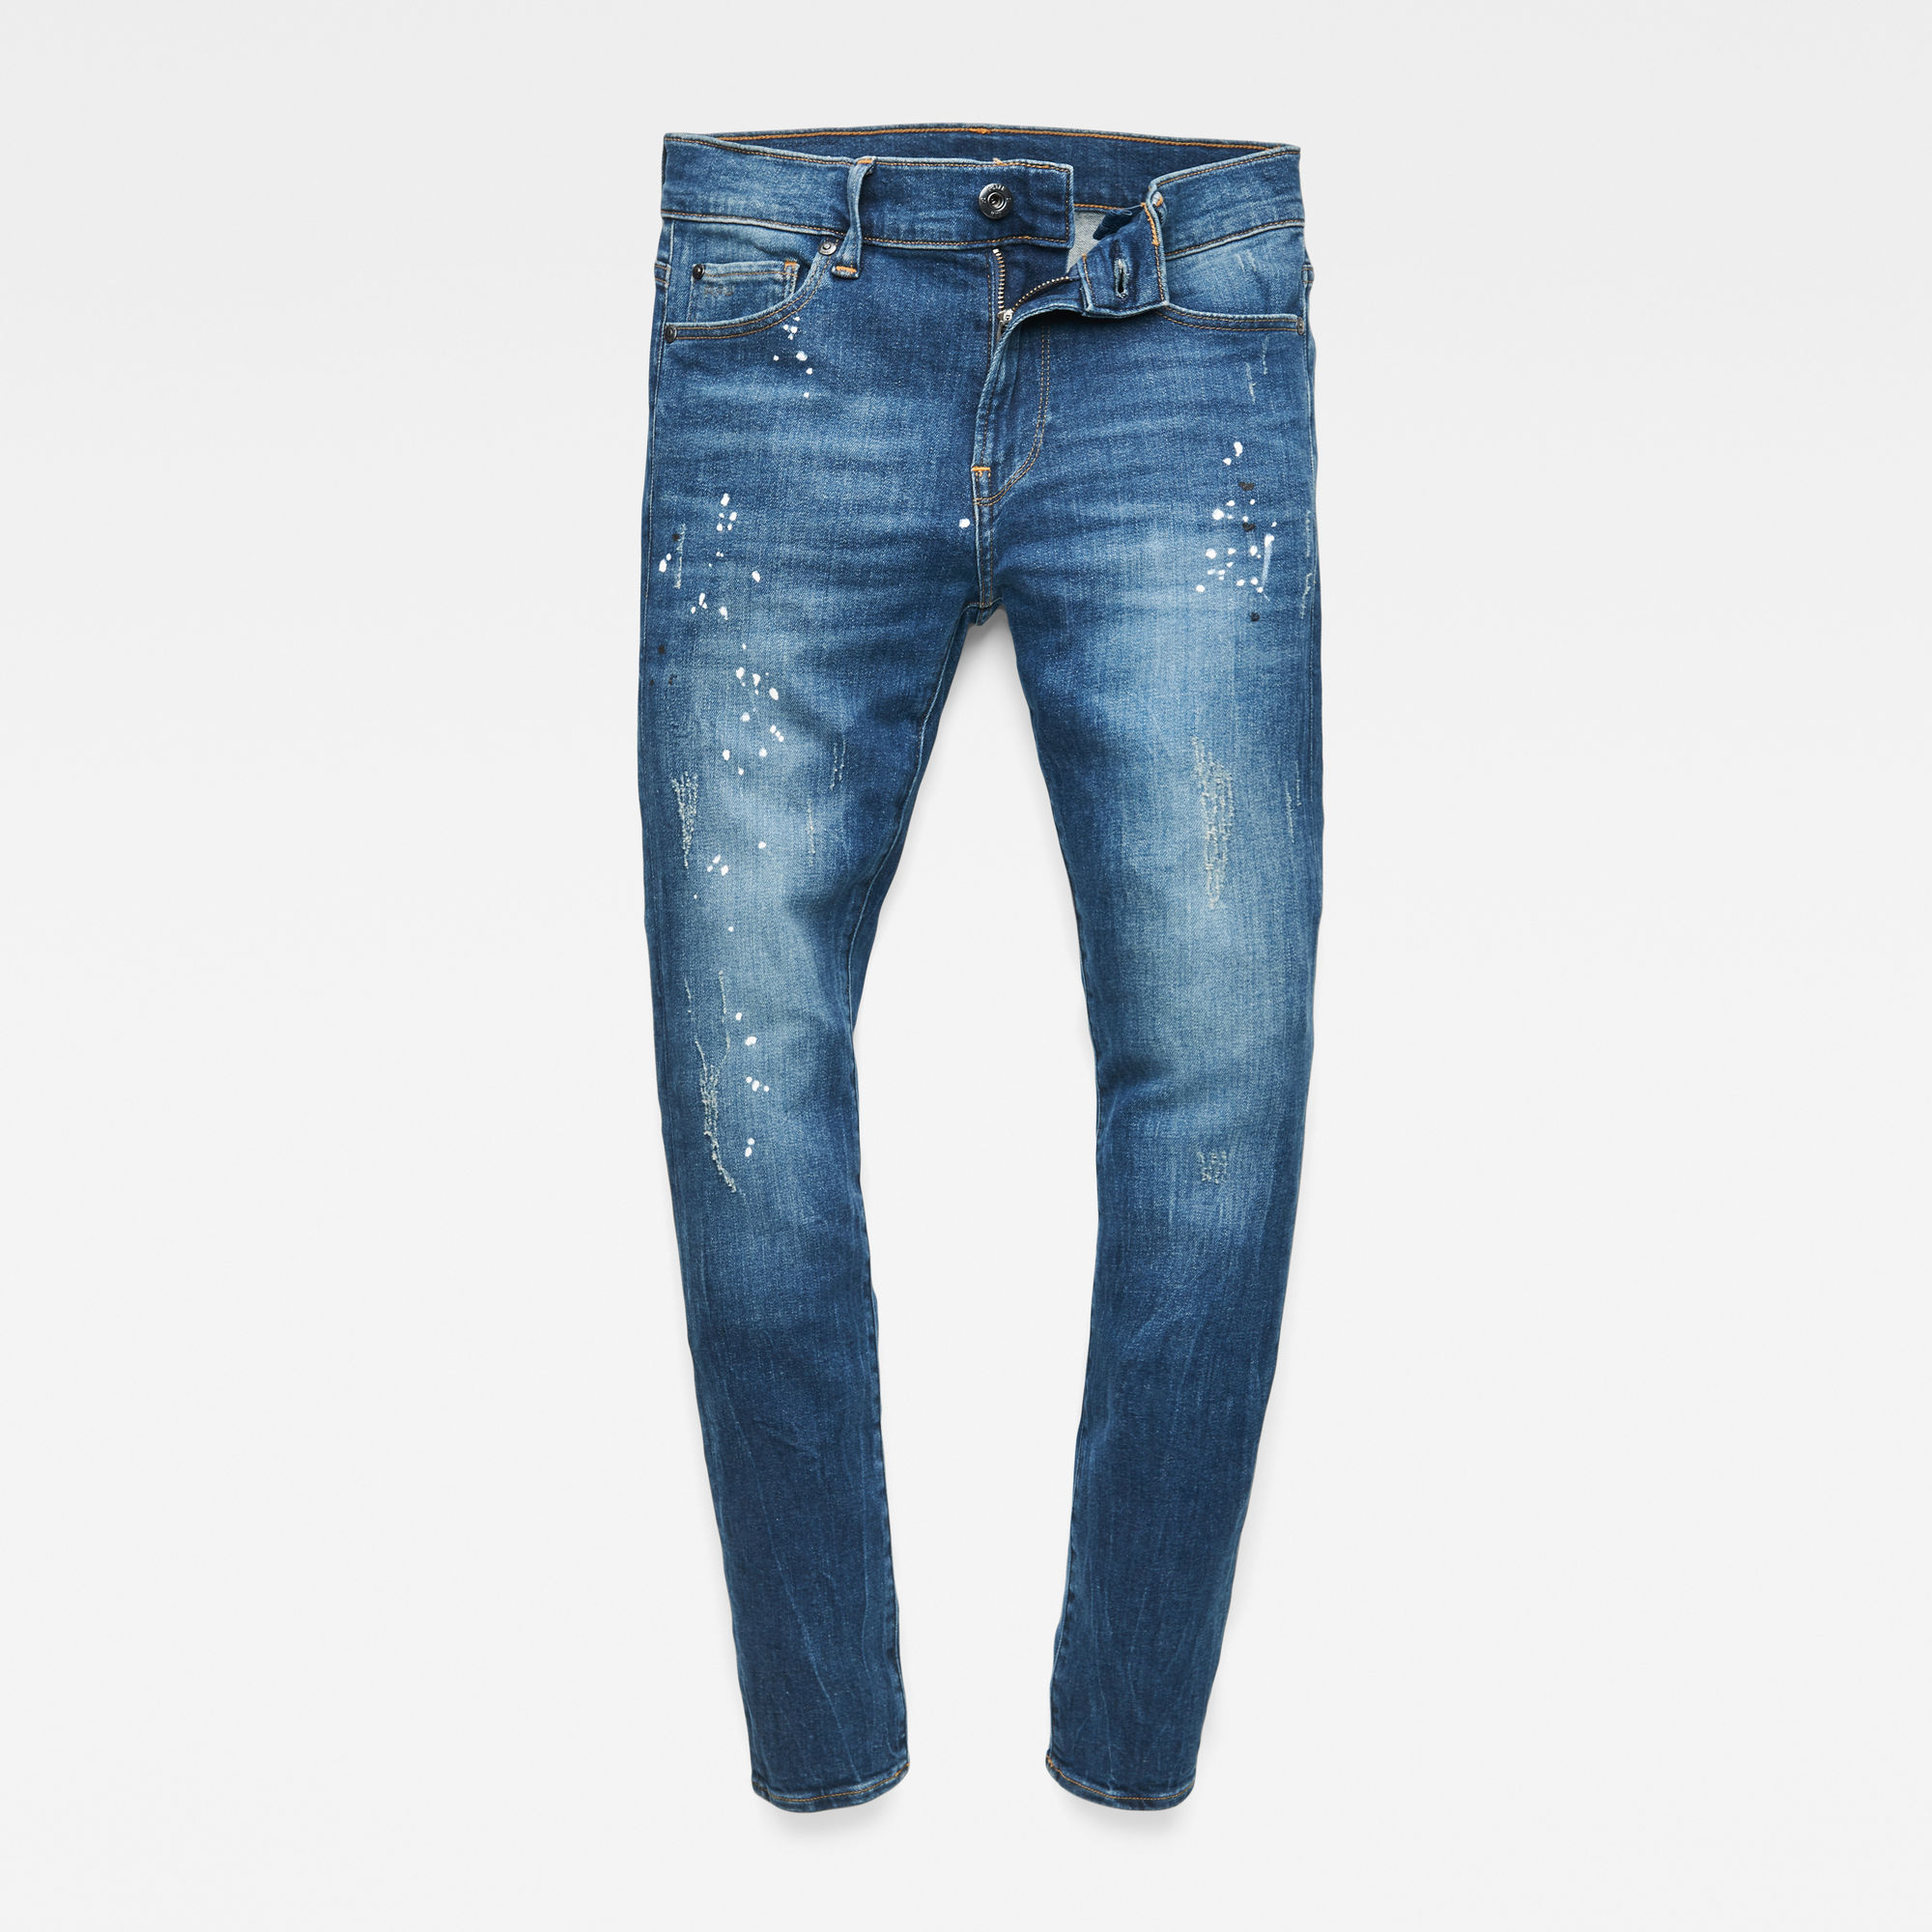 G-Star RAW Jongens 3301 Skinny jeans Blauw